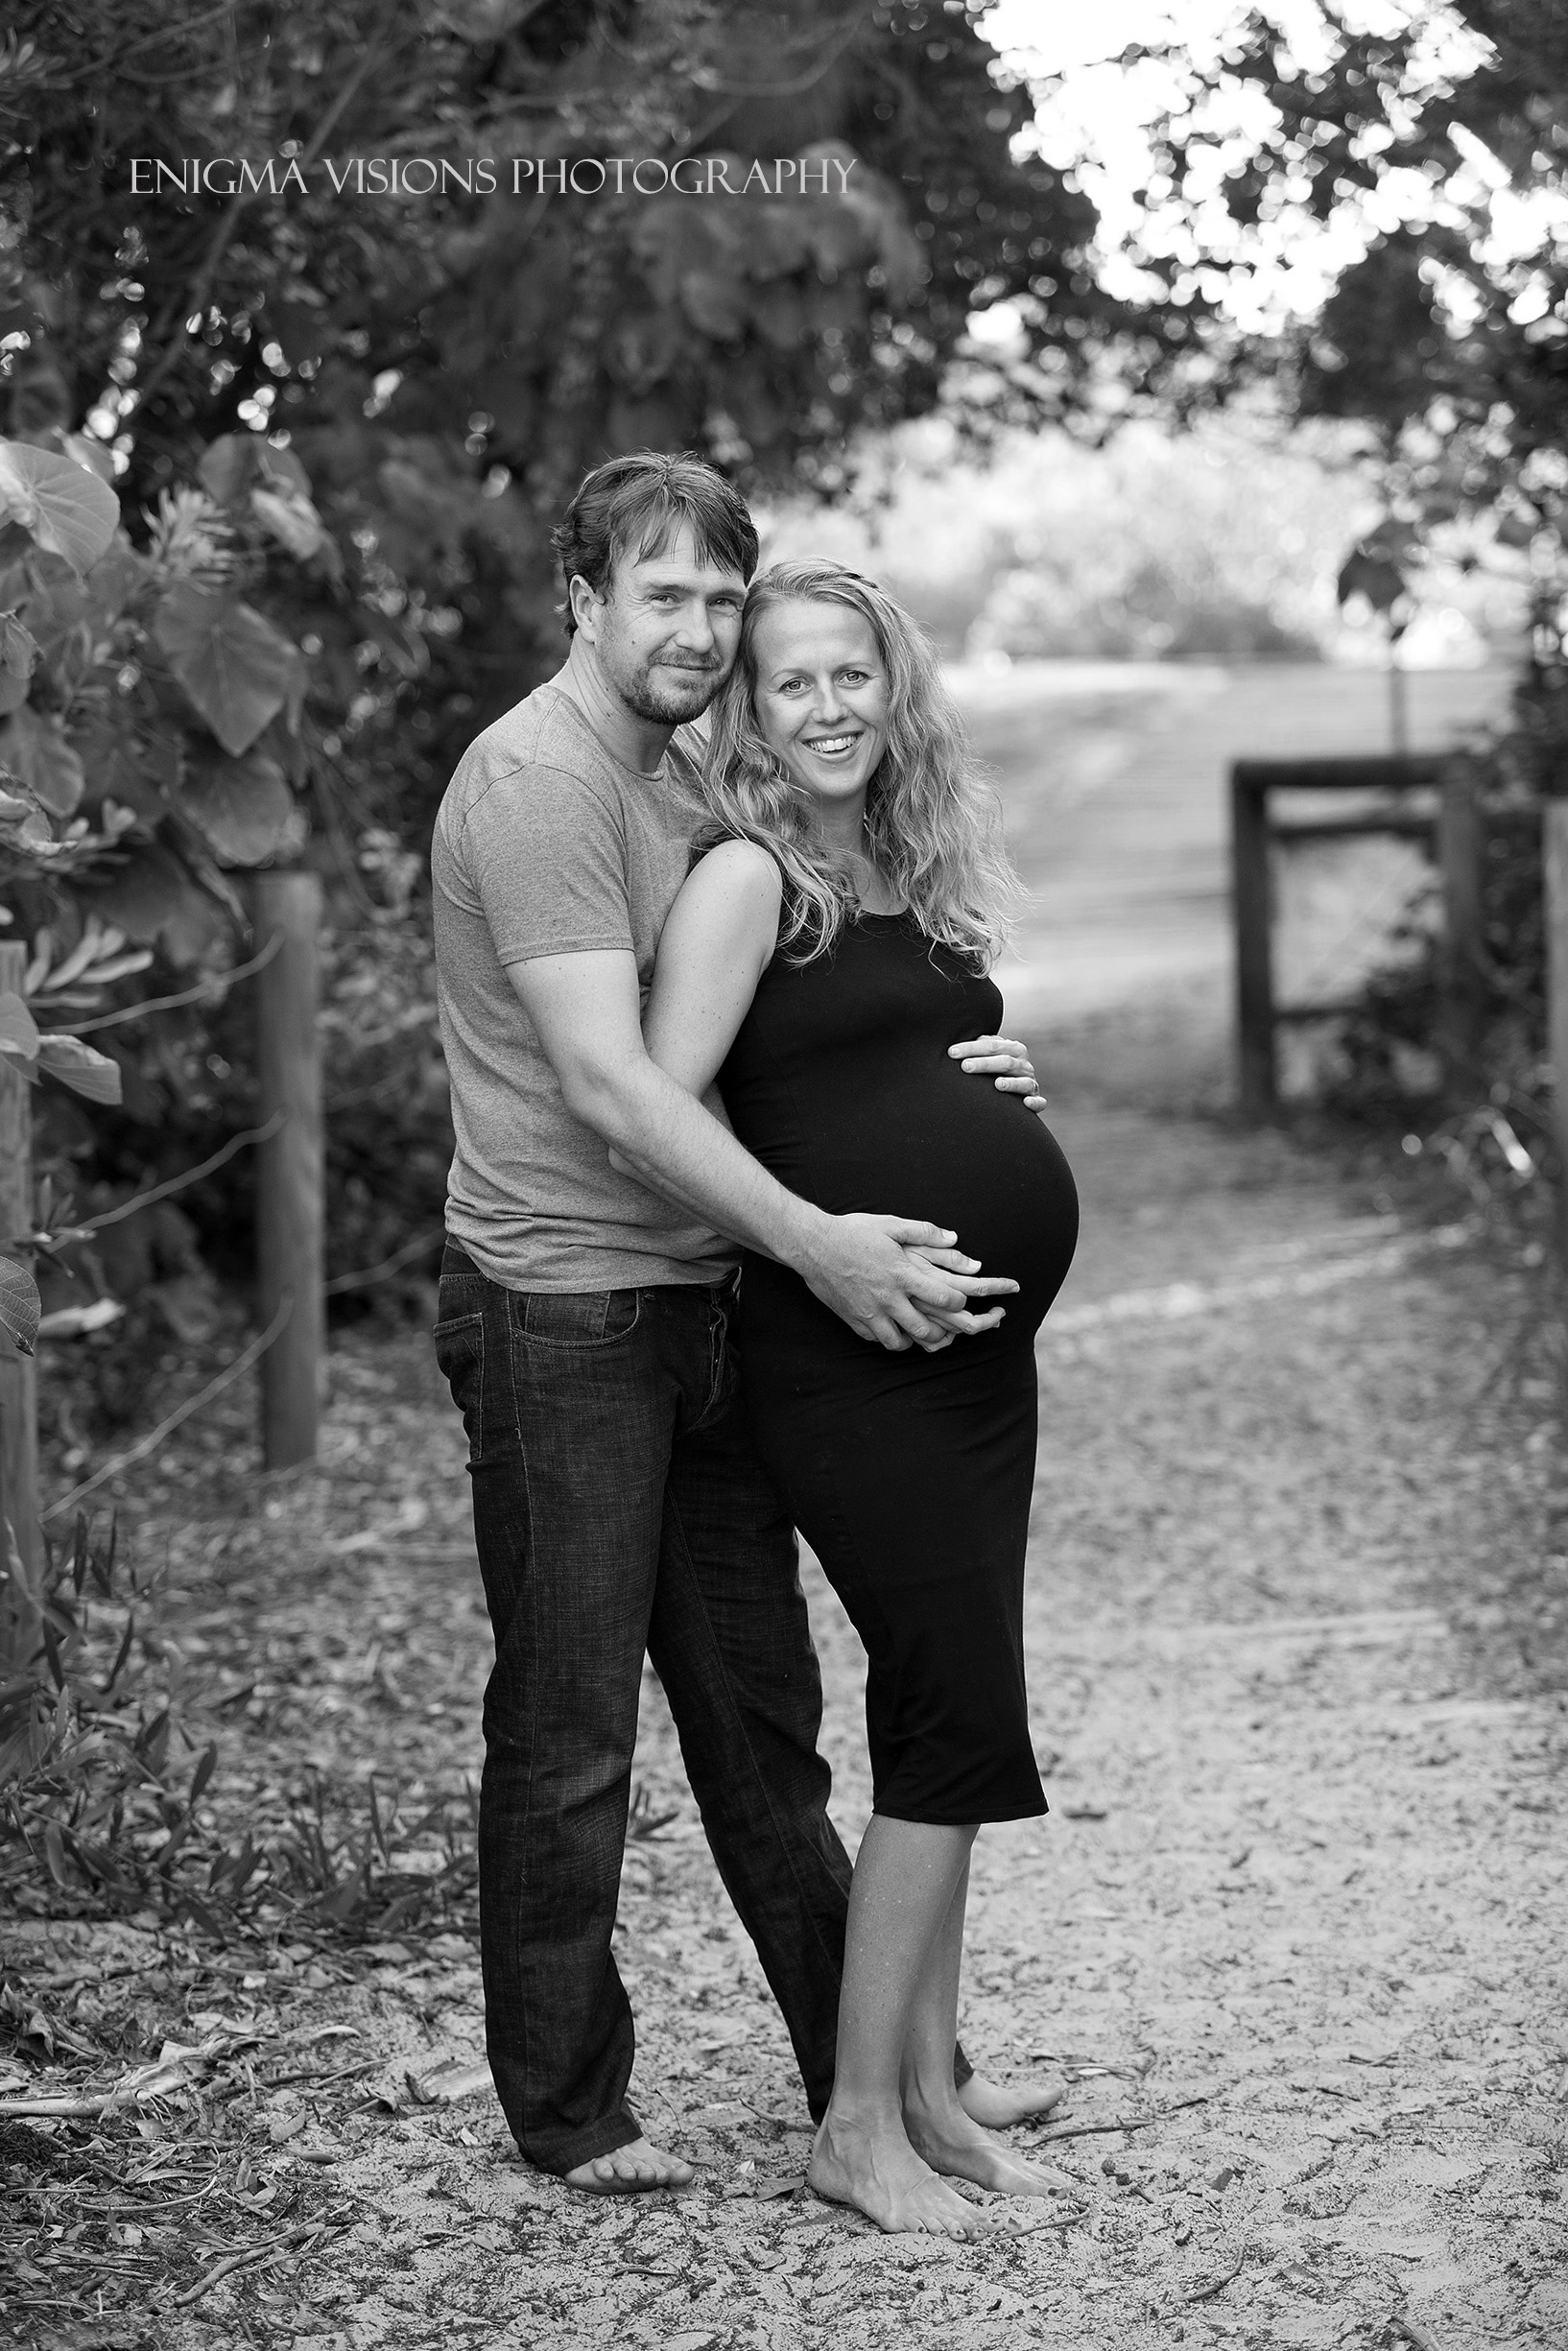 enigma_visions_photography_maternity_melandandrew_kingscliff (8).jpg